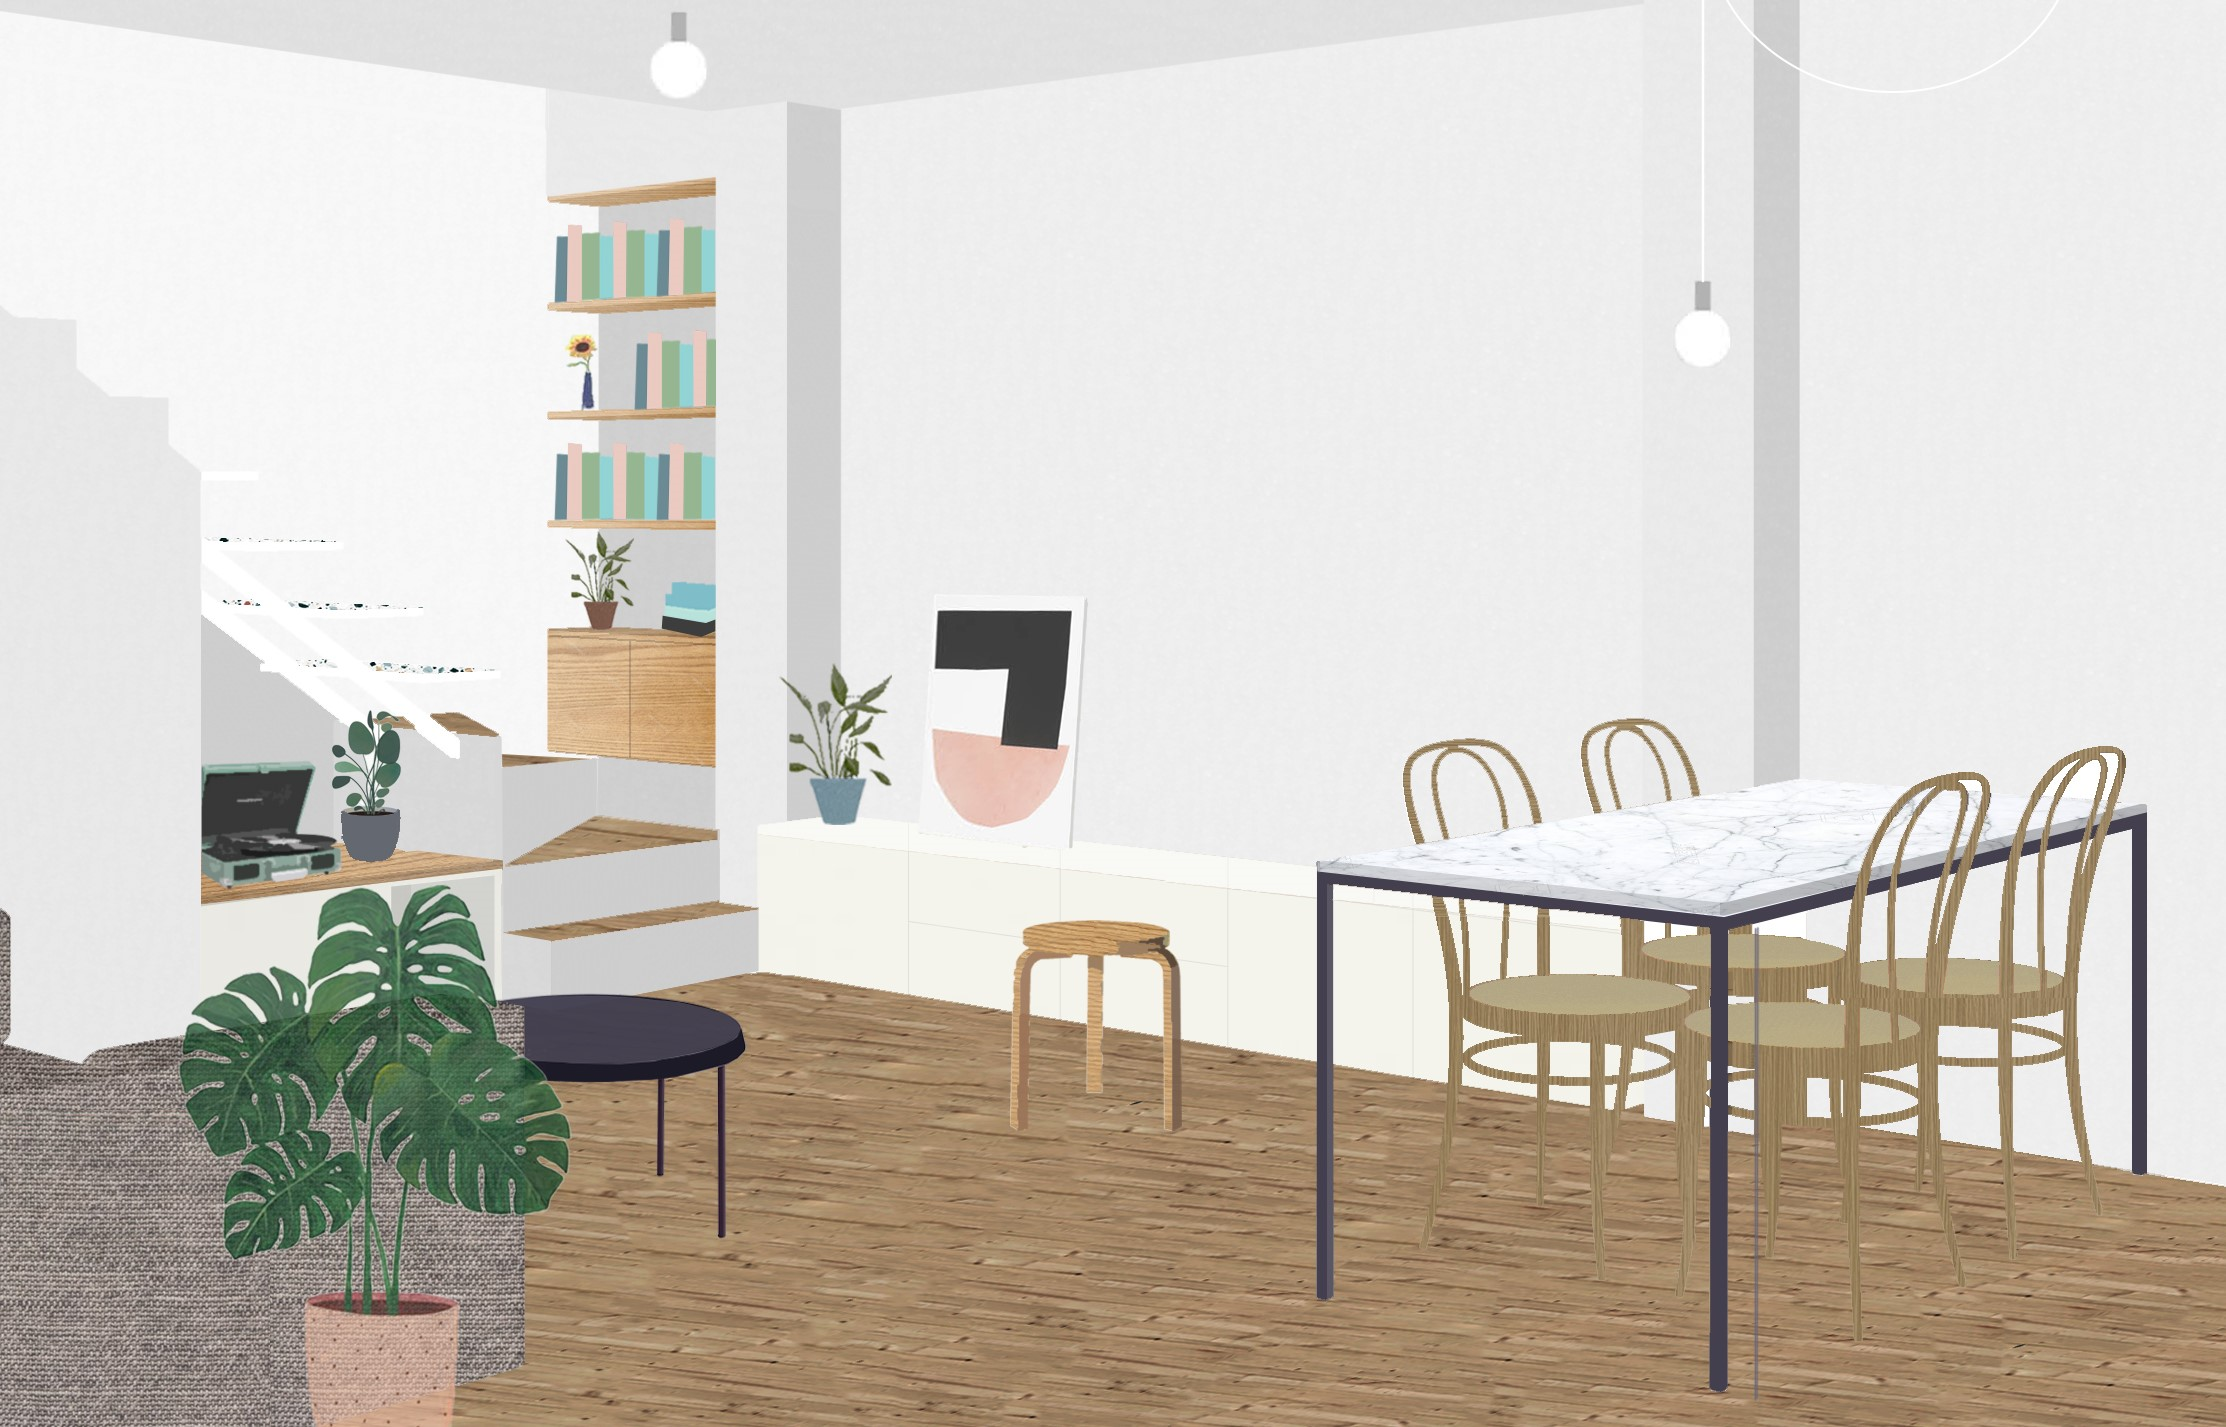 architecture render atmosphere interior render living room